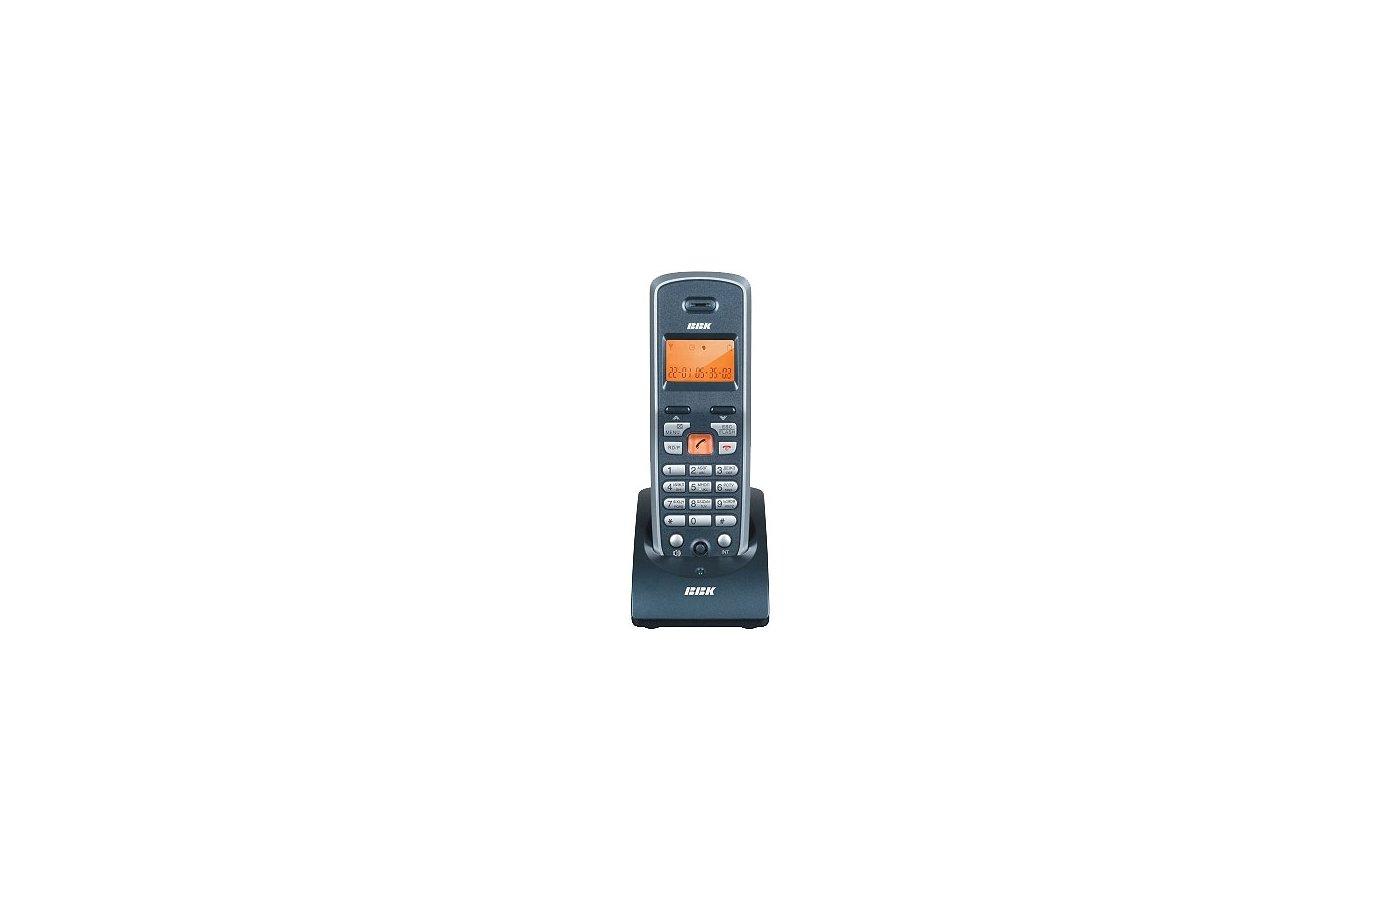 Радиотелефон BBK BKD-23 серебро